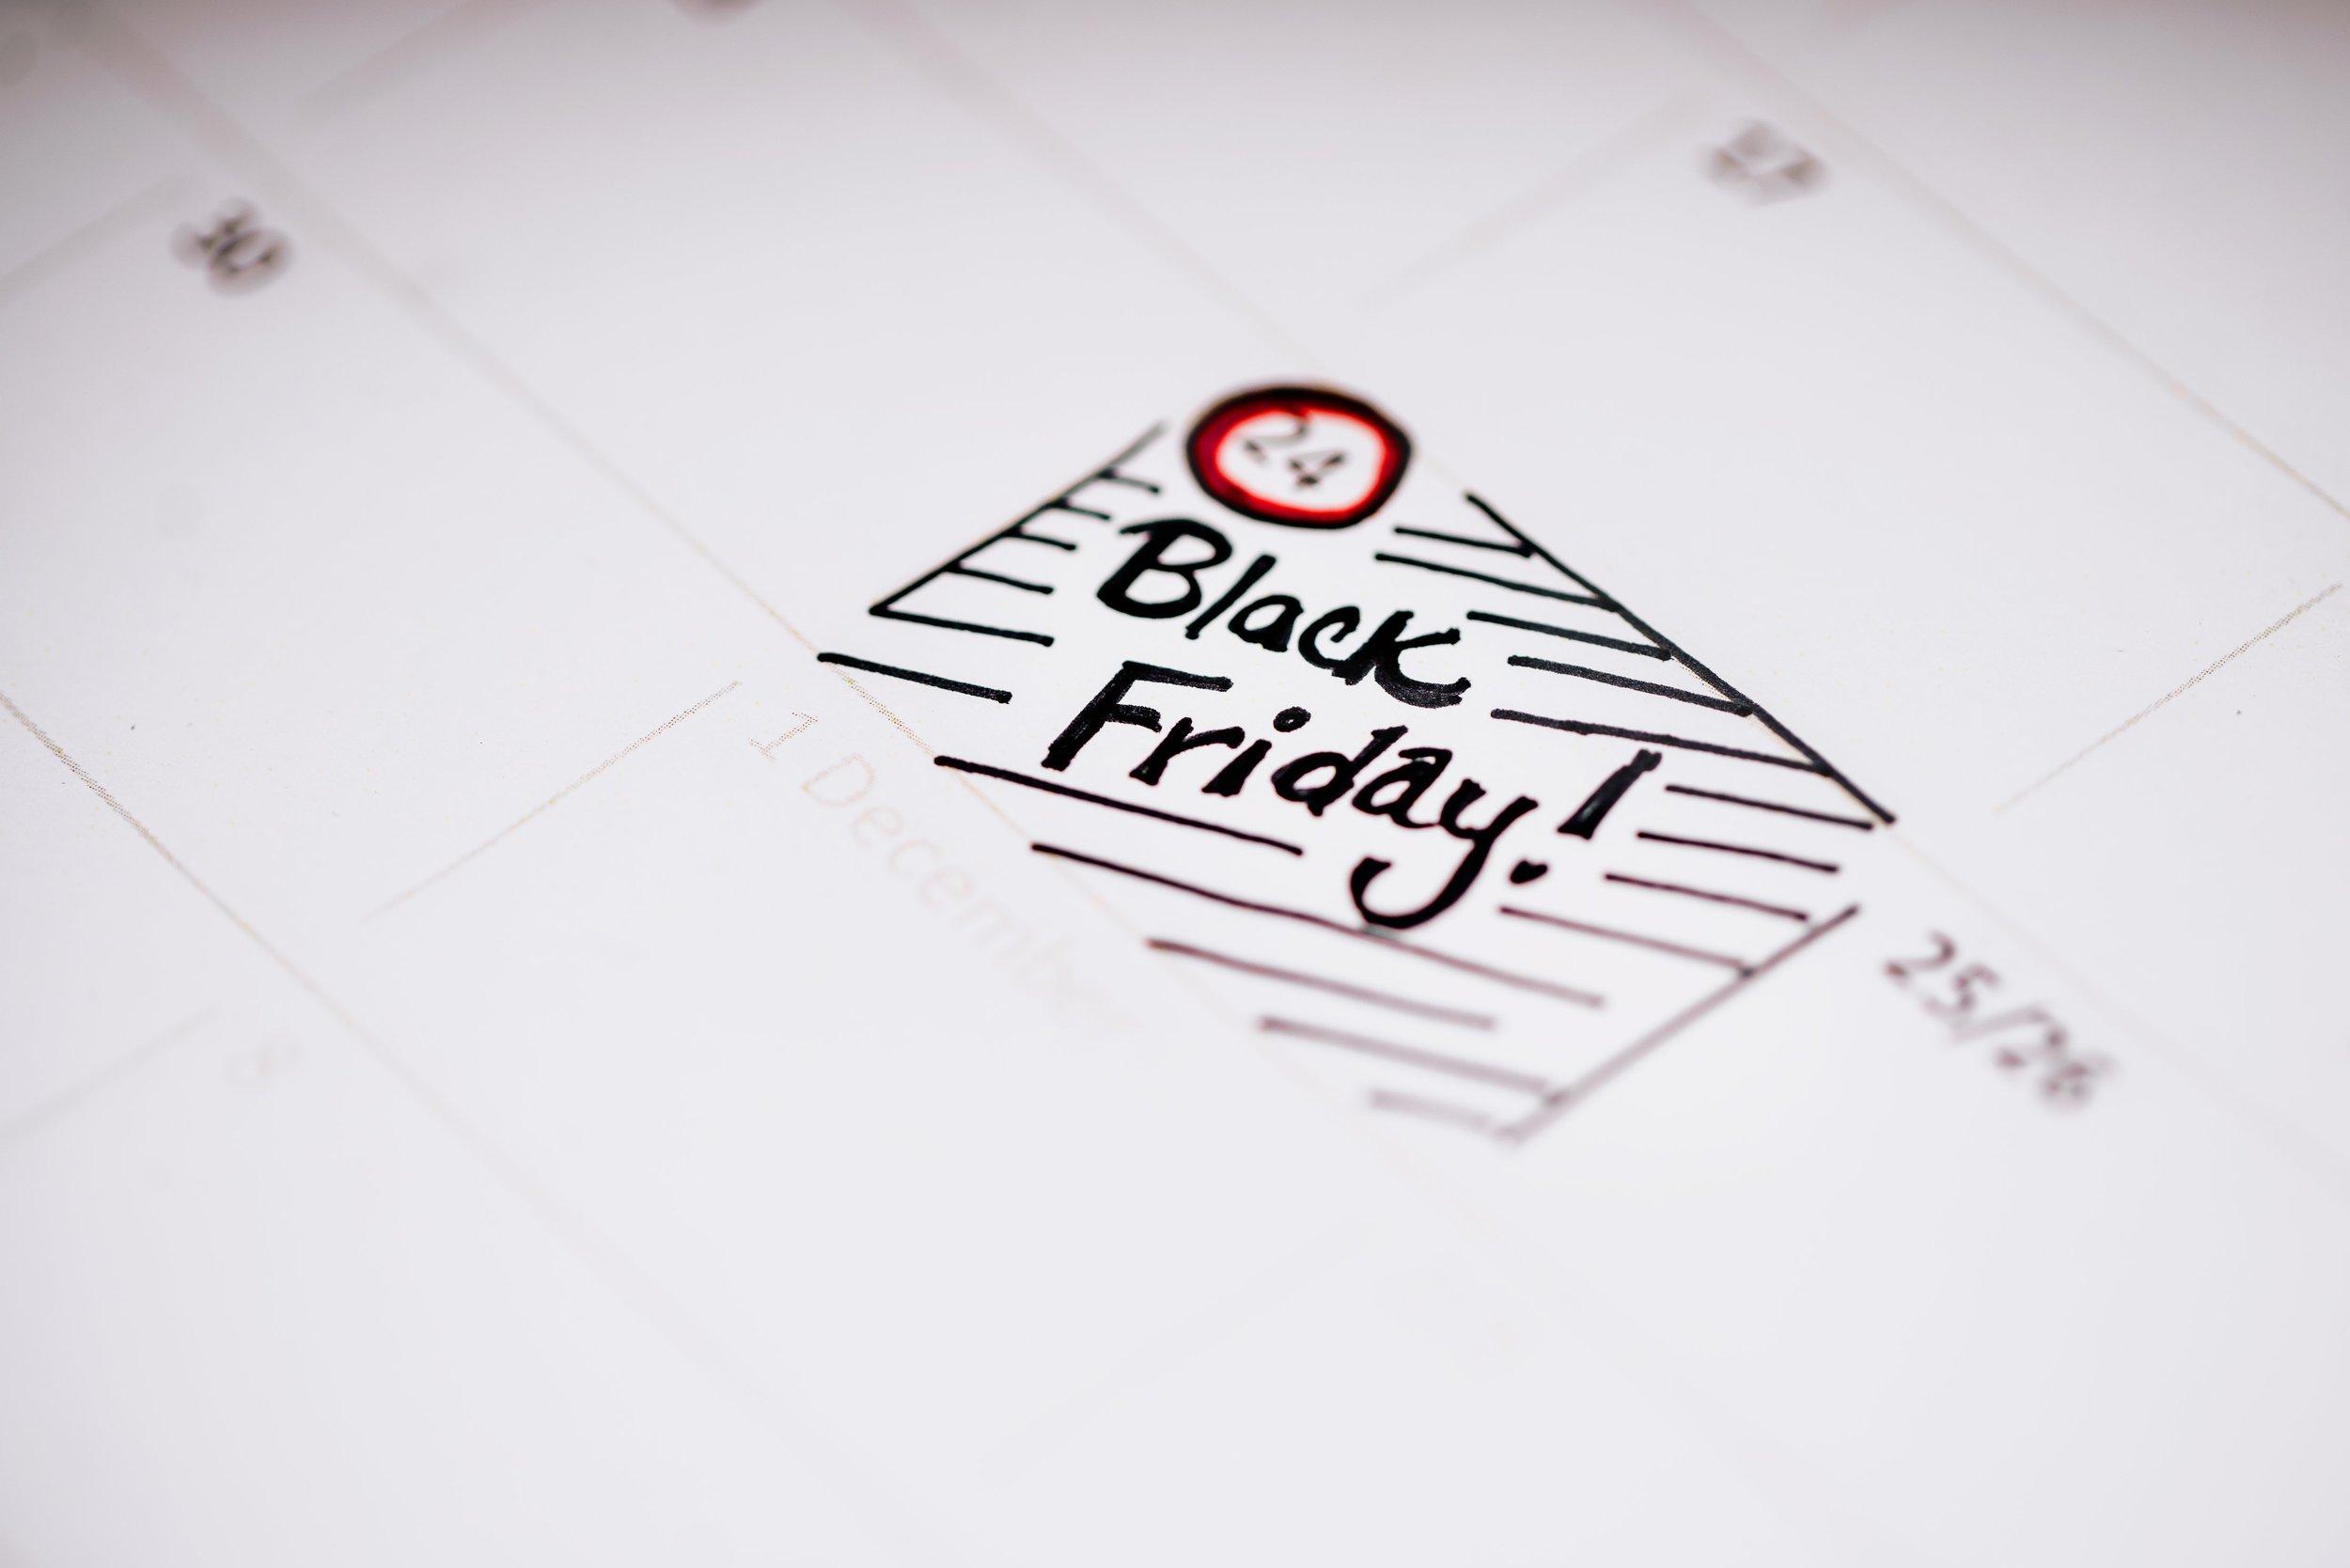 black-friday-calendar_4460x4460.jpg